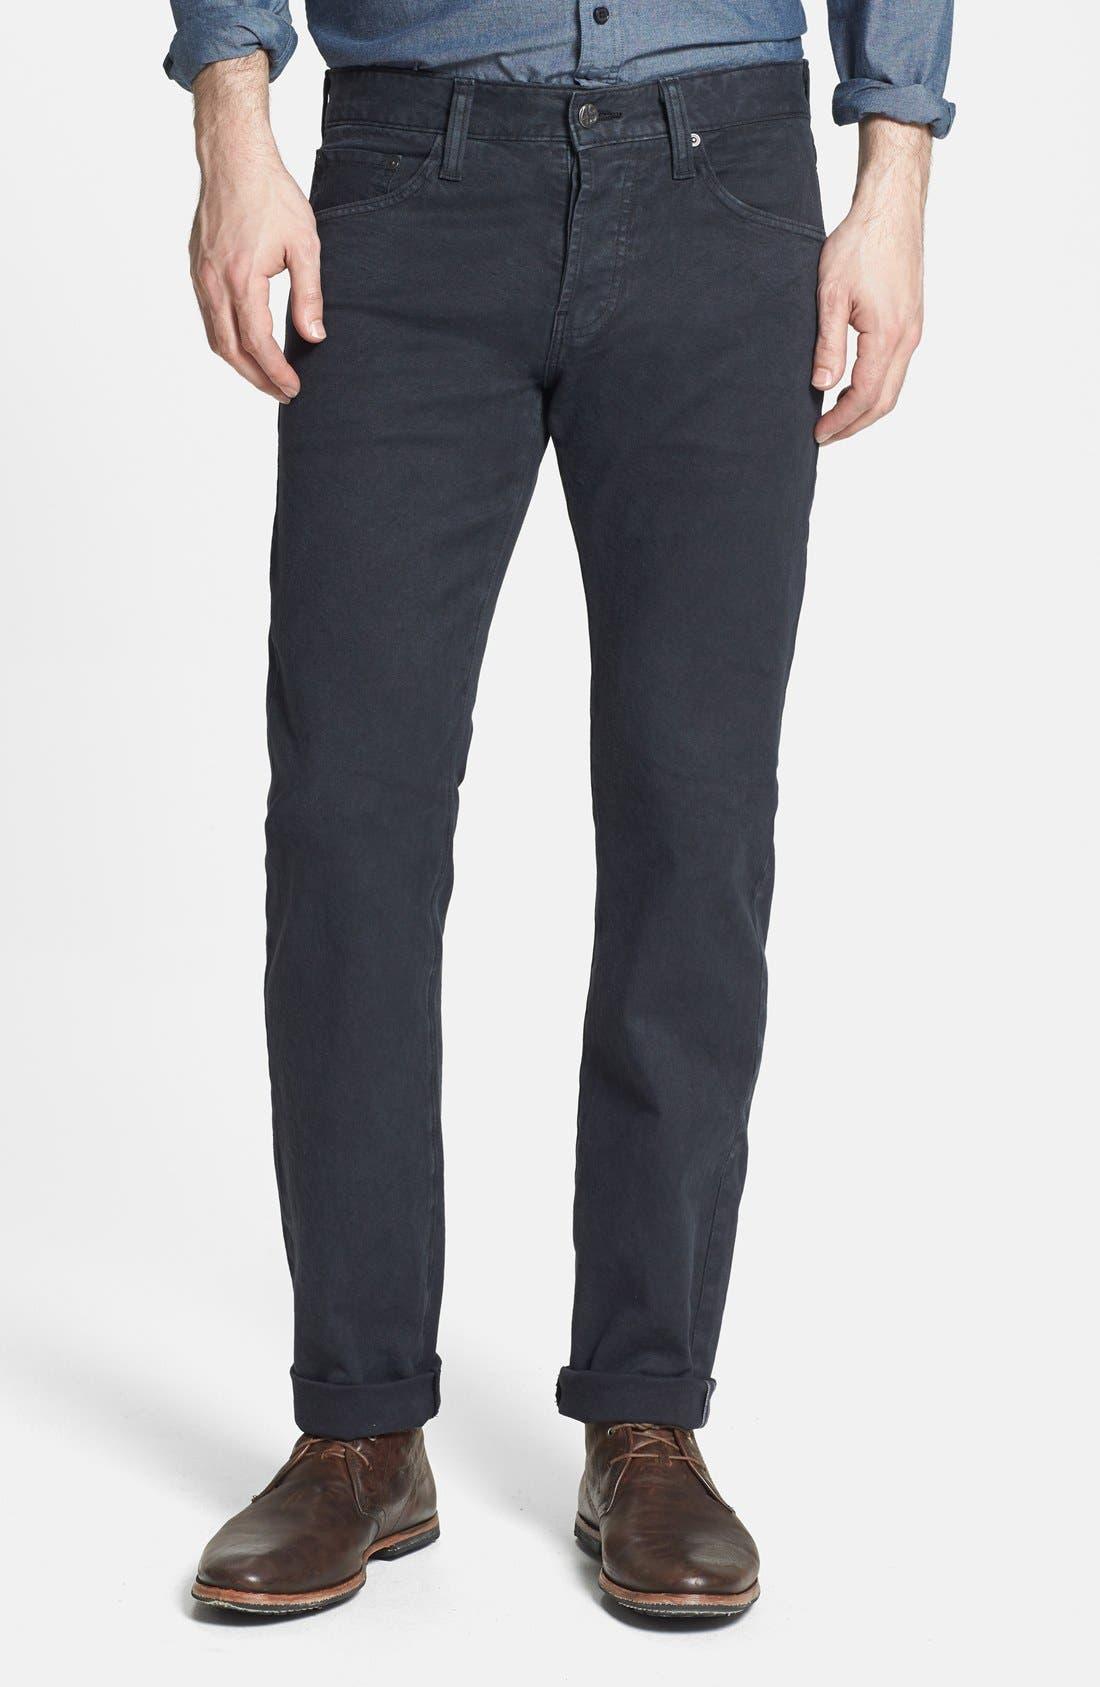 Alternate Image 1 Selected - AG 'Matchbox' Slim Fit Selvedge Jeans (True Black)